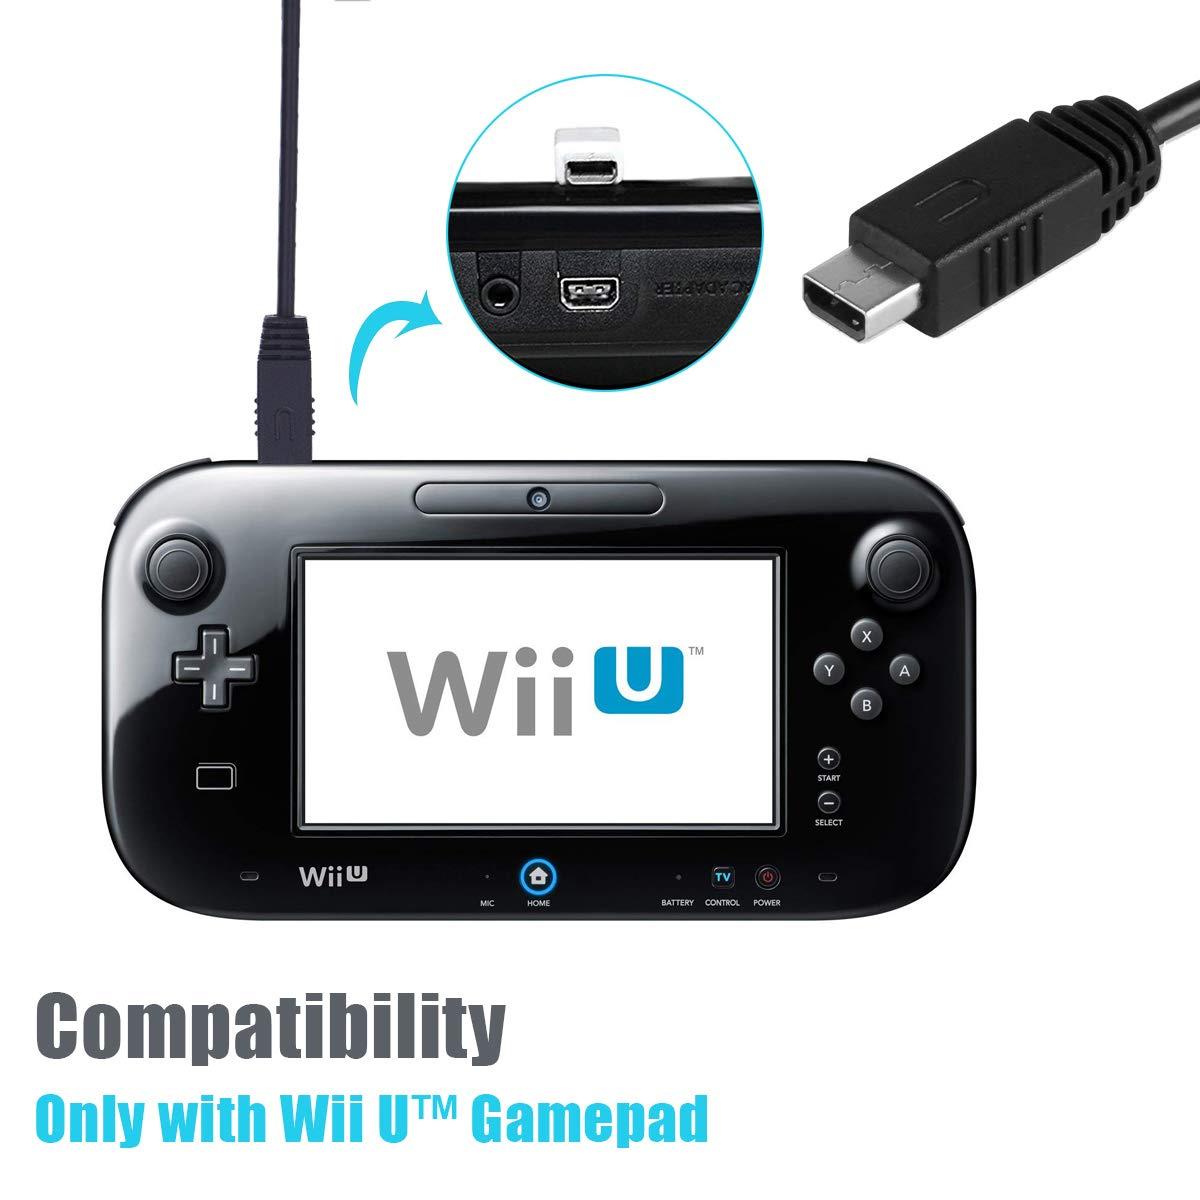 Cable cargador Wii U de 6 amLifestyle 3 m extra largo USB ...